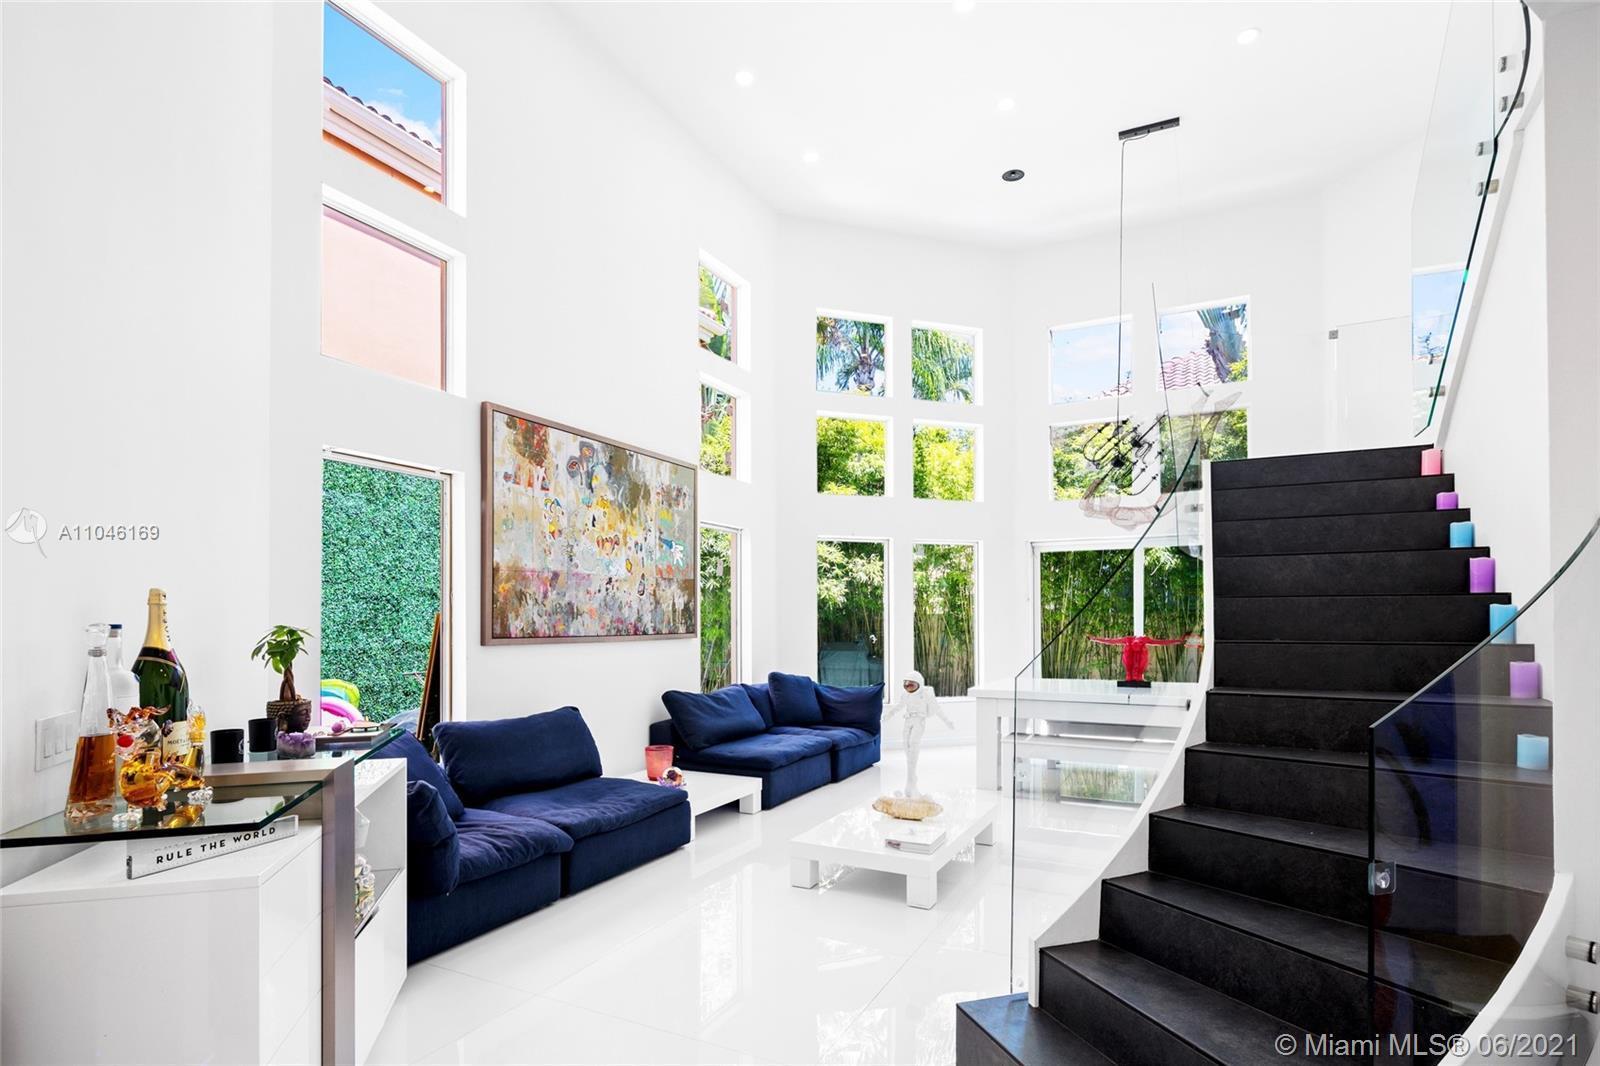 Single Family Residence 3/3 + 2 Car Garage & Splash pool in the prestigious community of Island Way